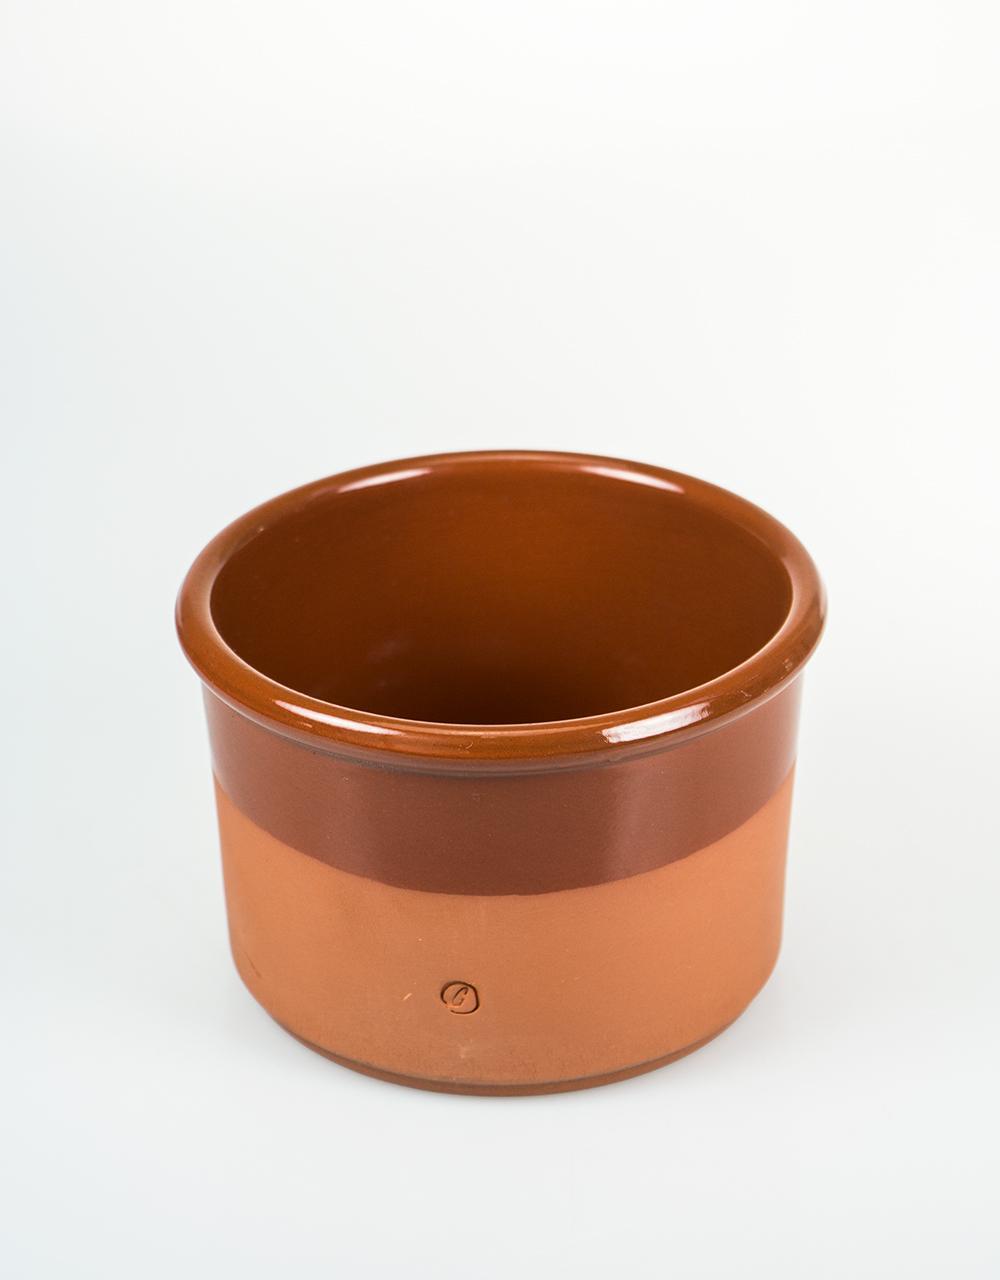 Graupera Custard Dish - Honey 12.5cm x 9cm